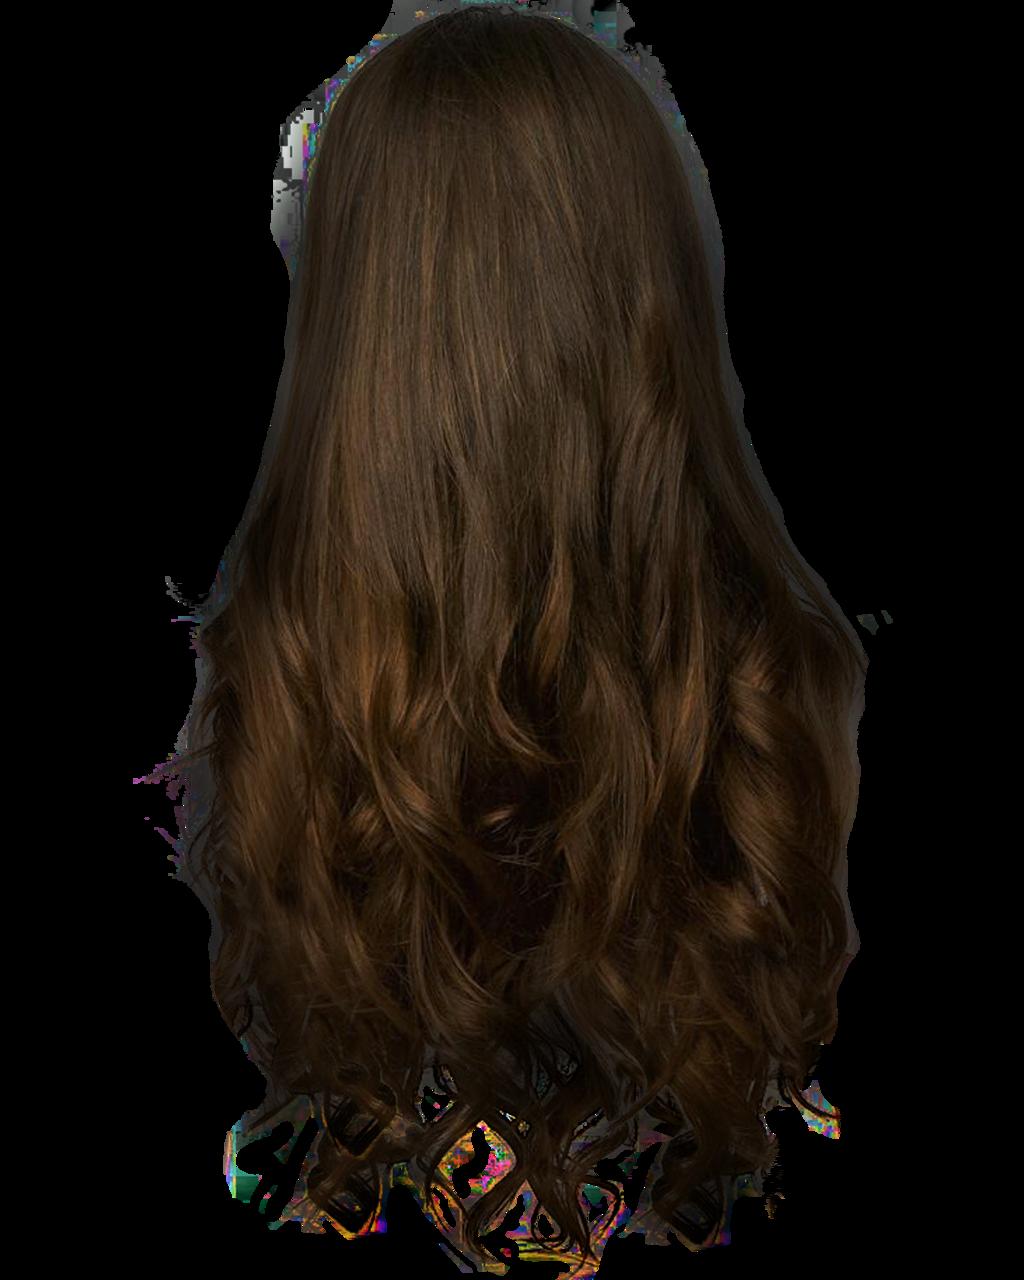 Blond Hair Blond Brunette Hair Curly Png 3975 Transparentpng